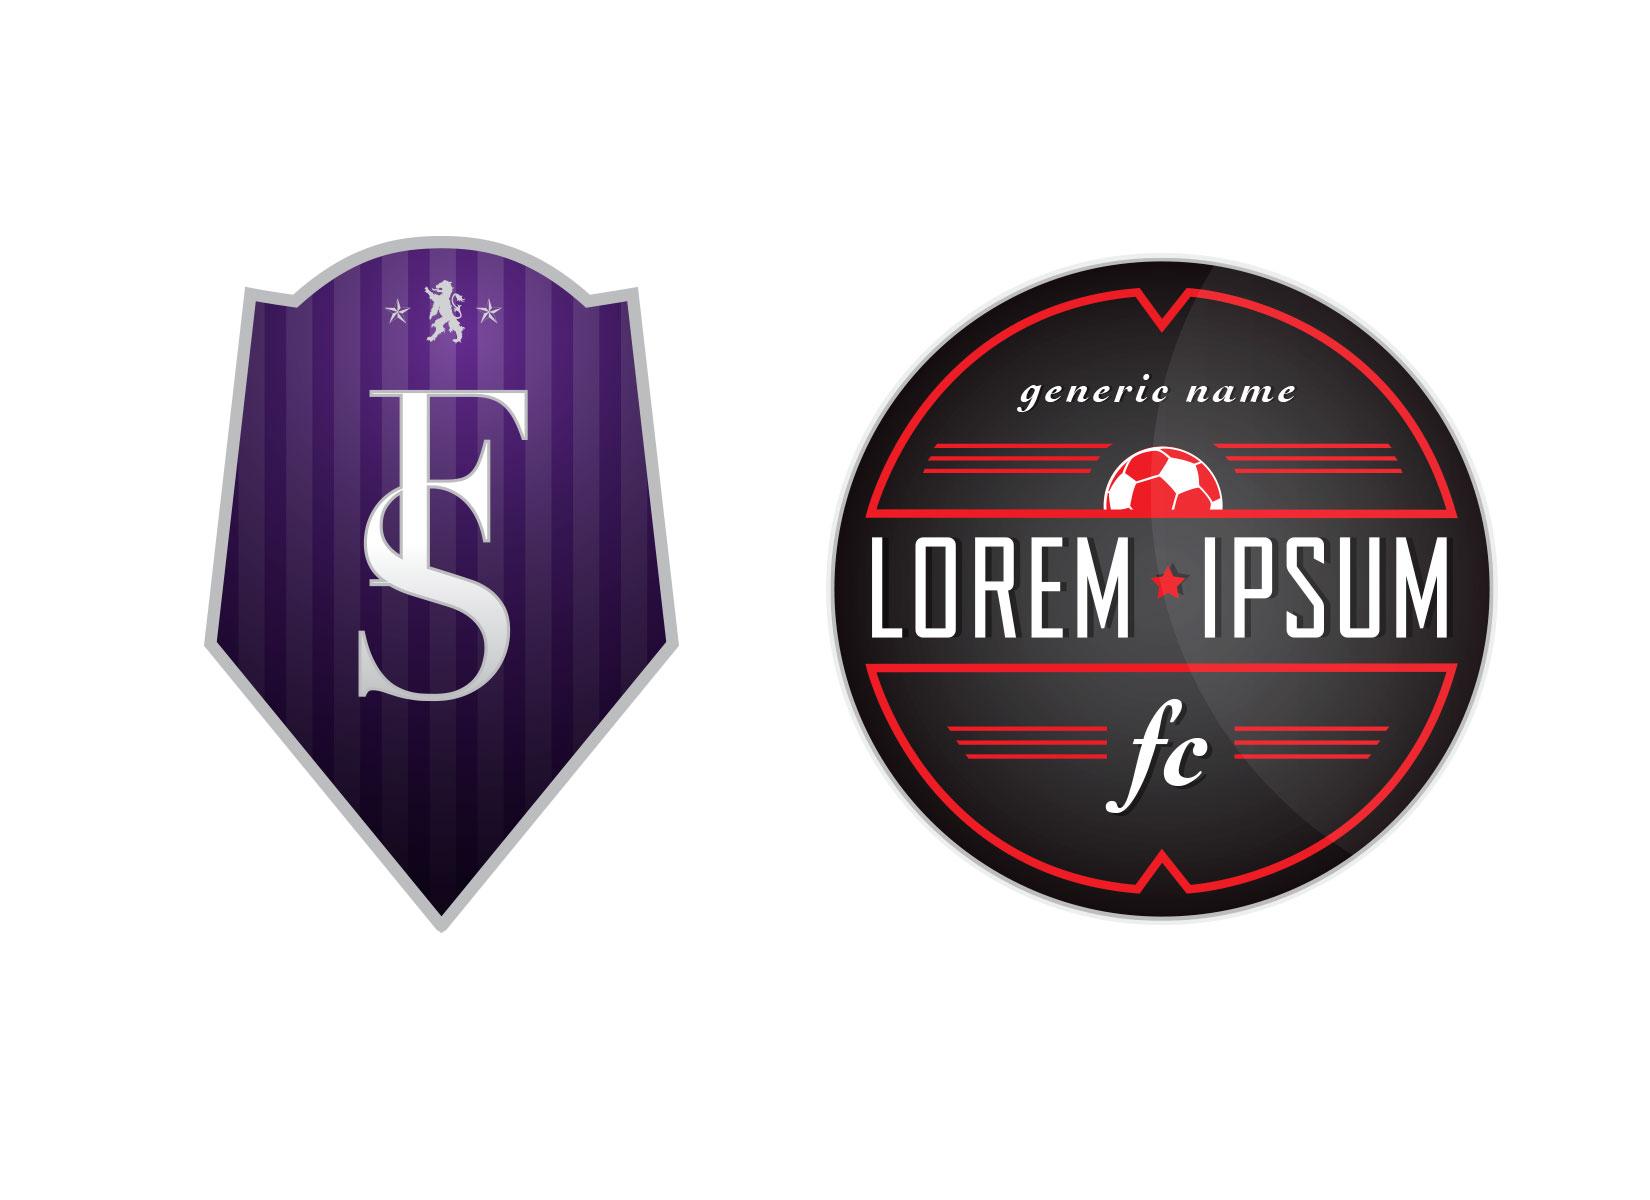 generic-soccer-crest-template-designs-by-jordan-fretz-2.jpg